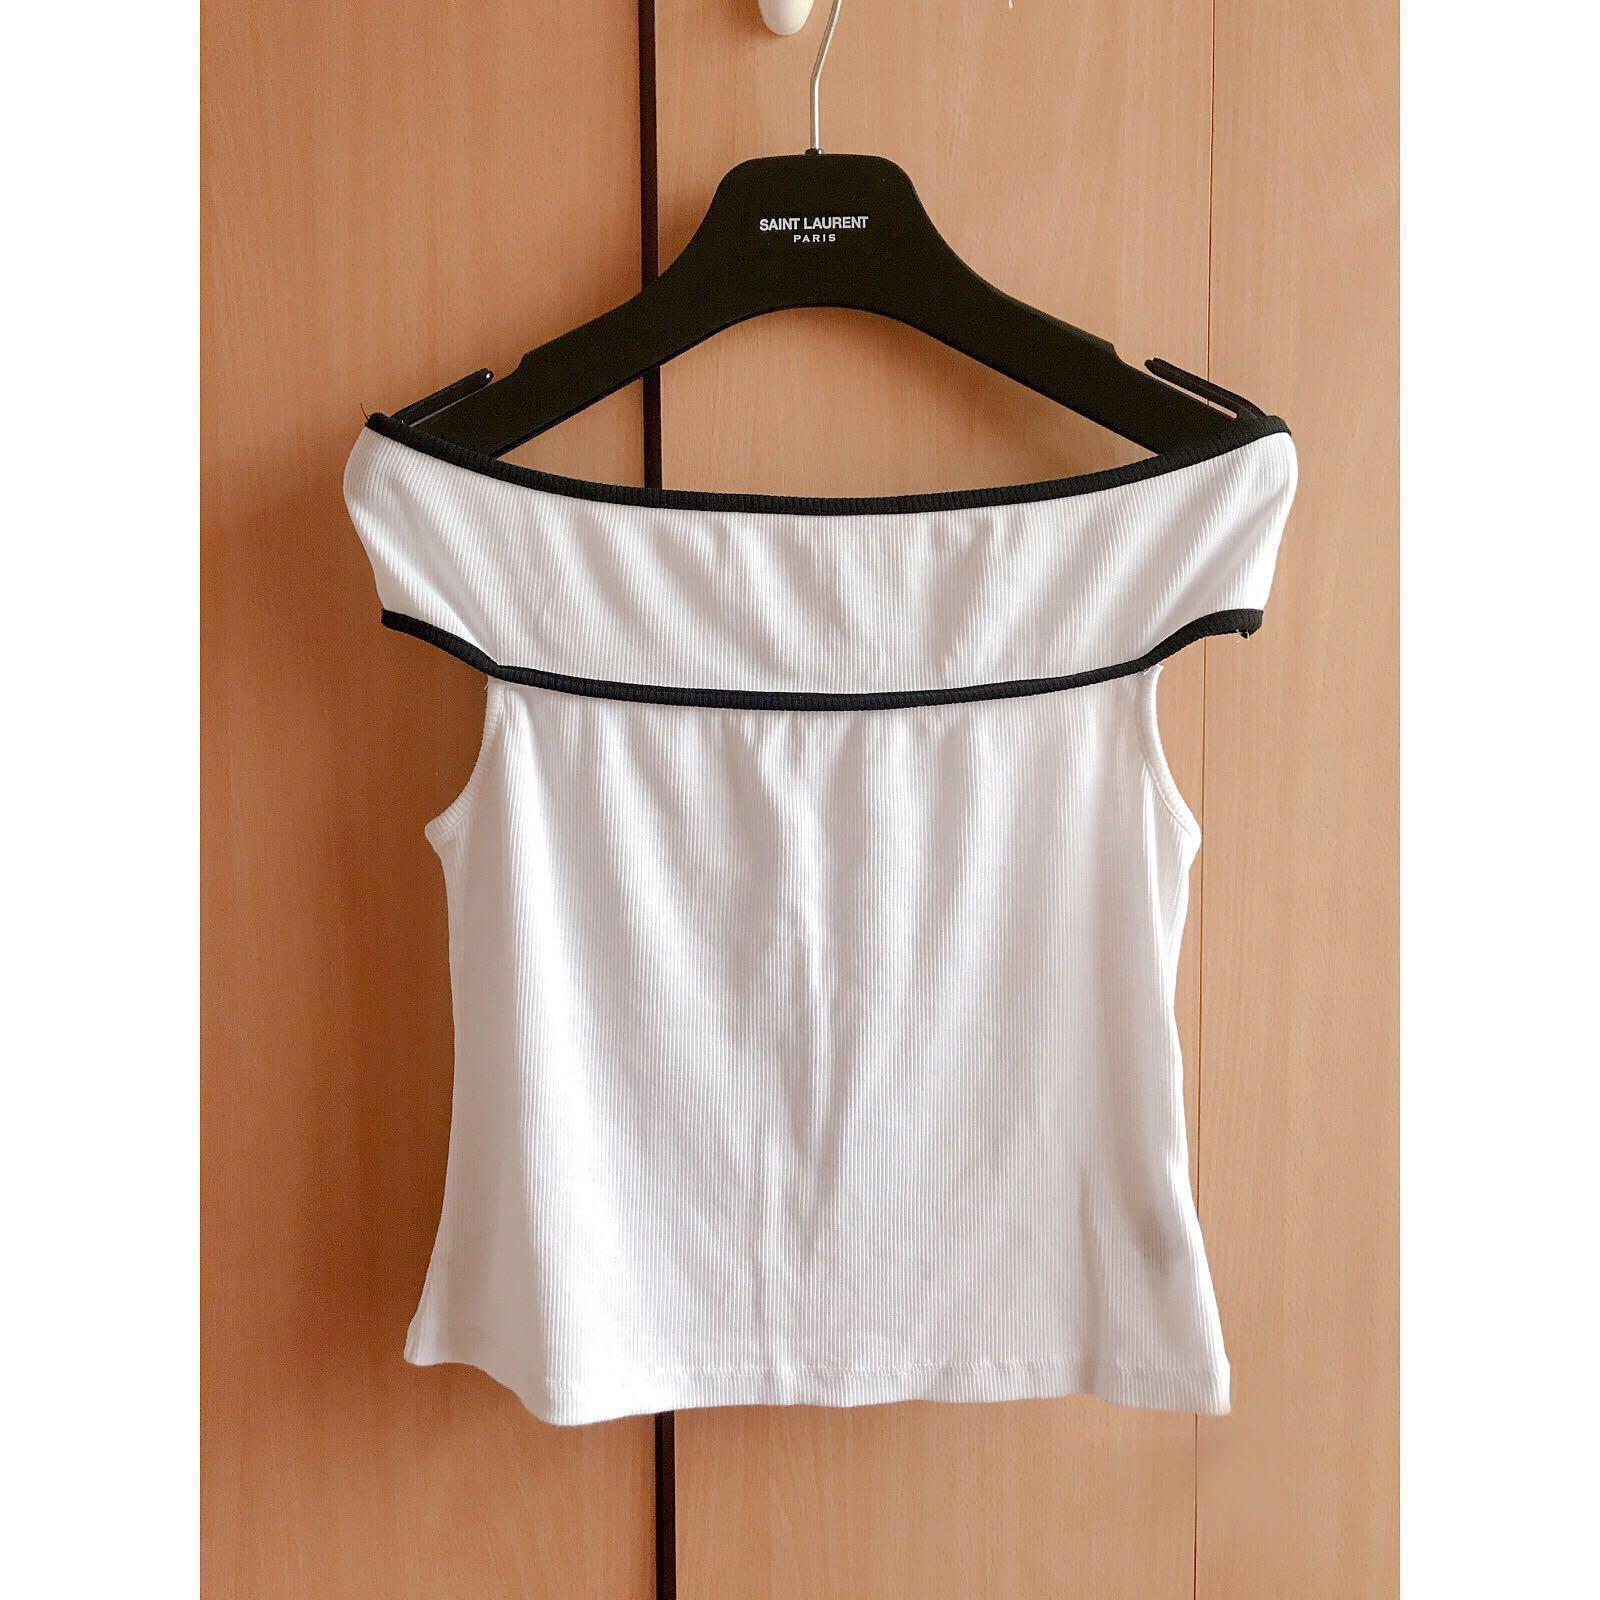 61ff3776bf7e5 Zara white off shoulder top blouse t shirt 白色線條露肩一字領襯衫 ...